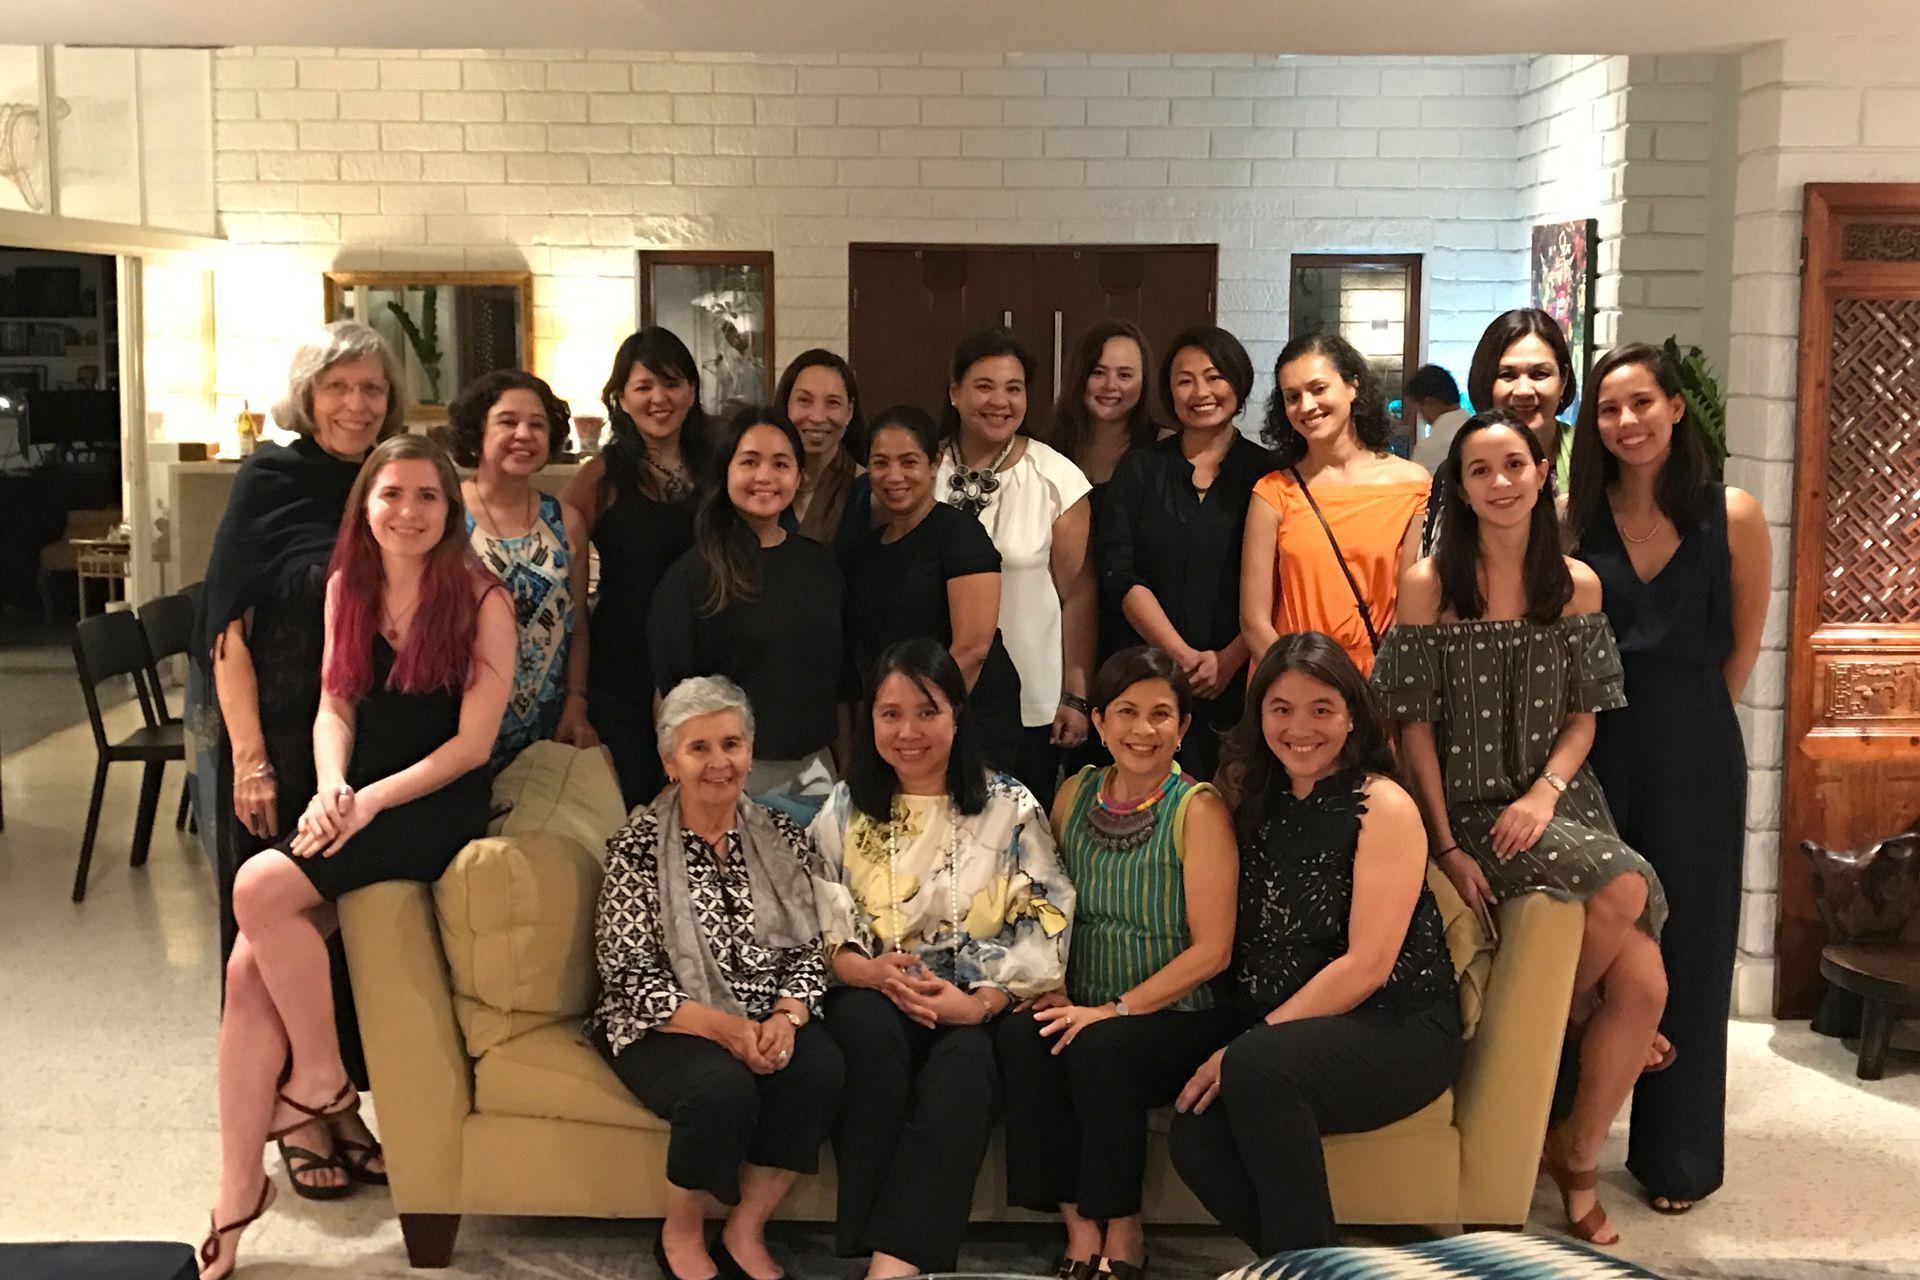 Celebrating Uncommon Women